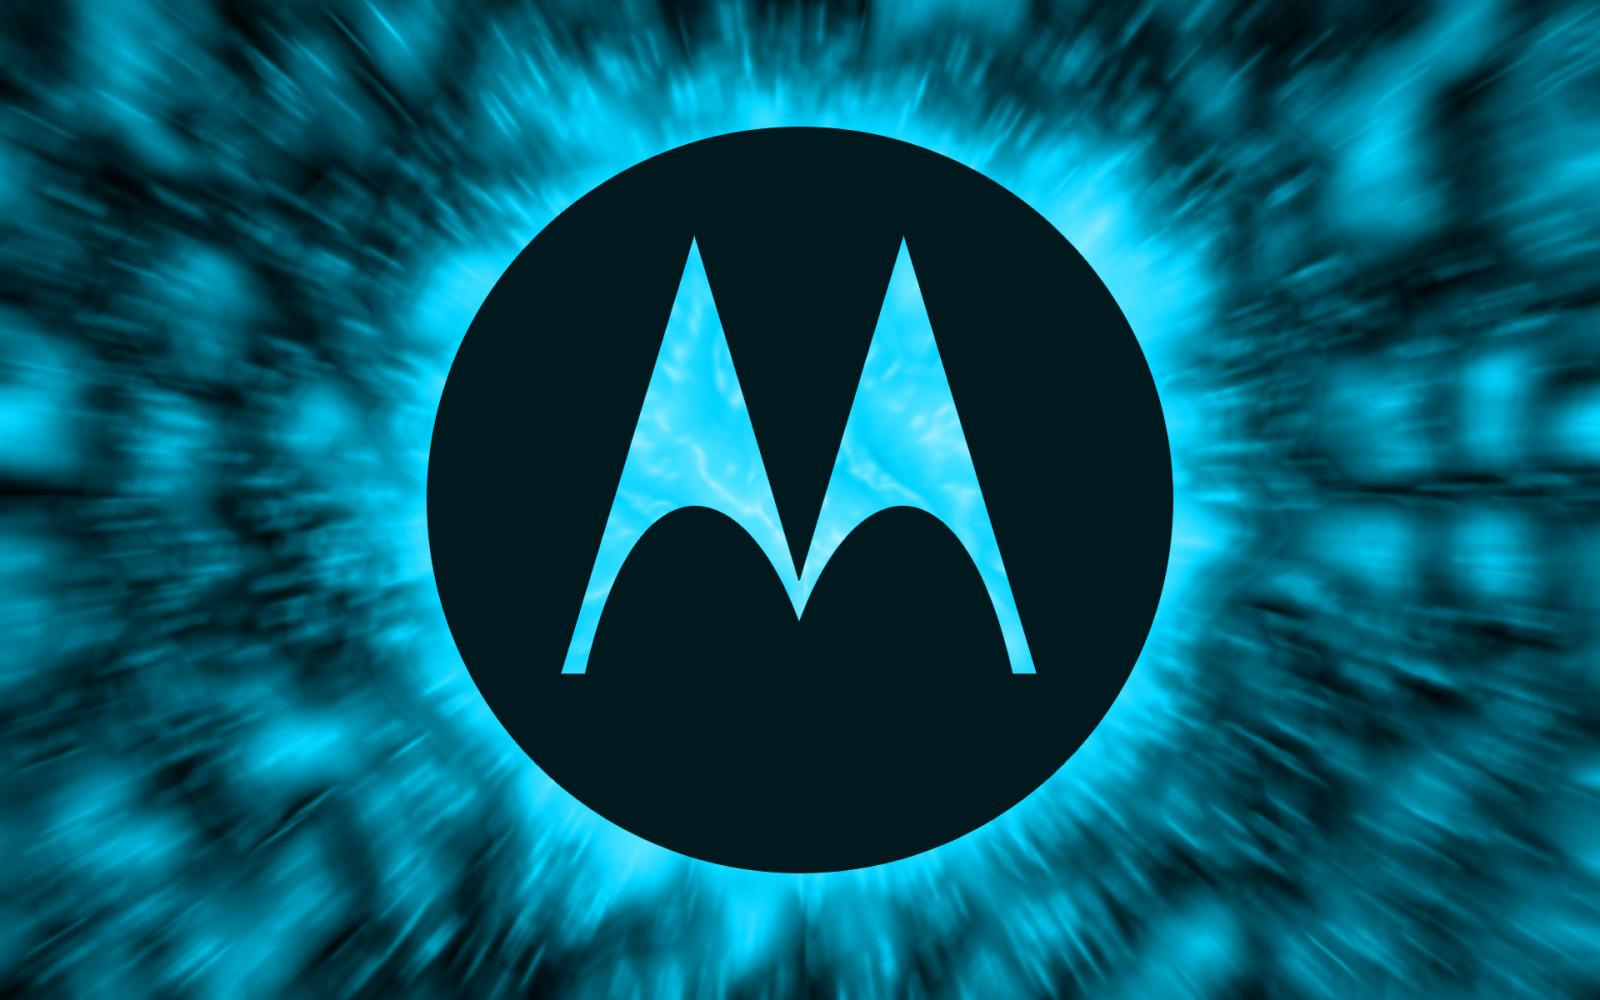 Motorola moto e wallpaper wallpapersafari - Moto g4 stock wallpapers ...